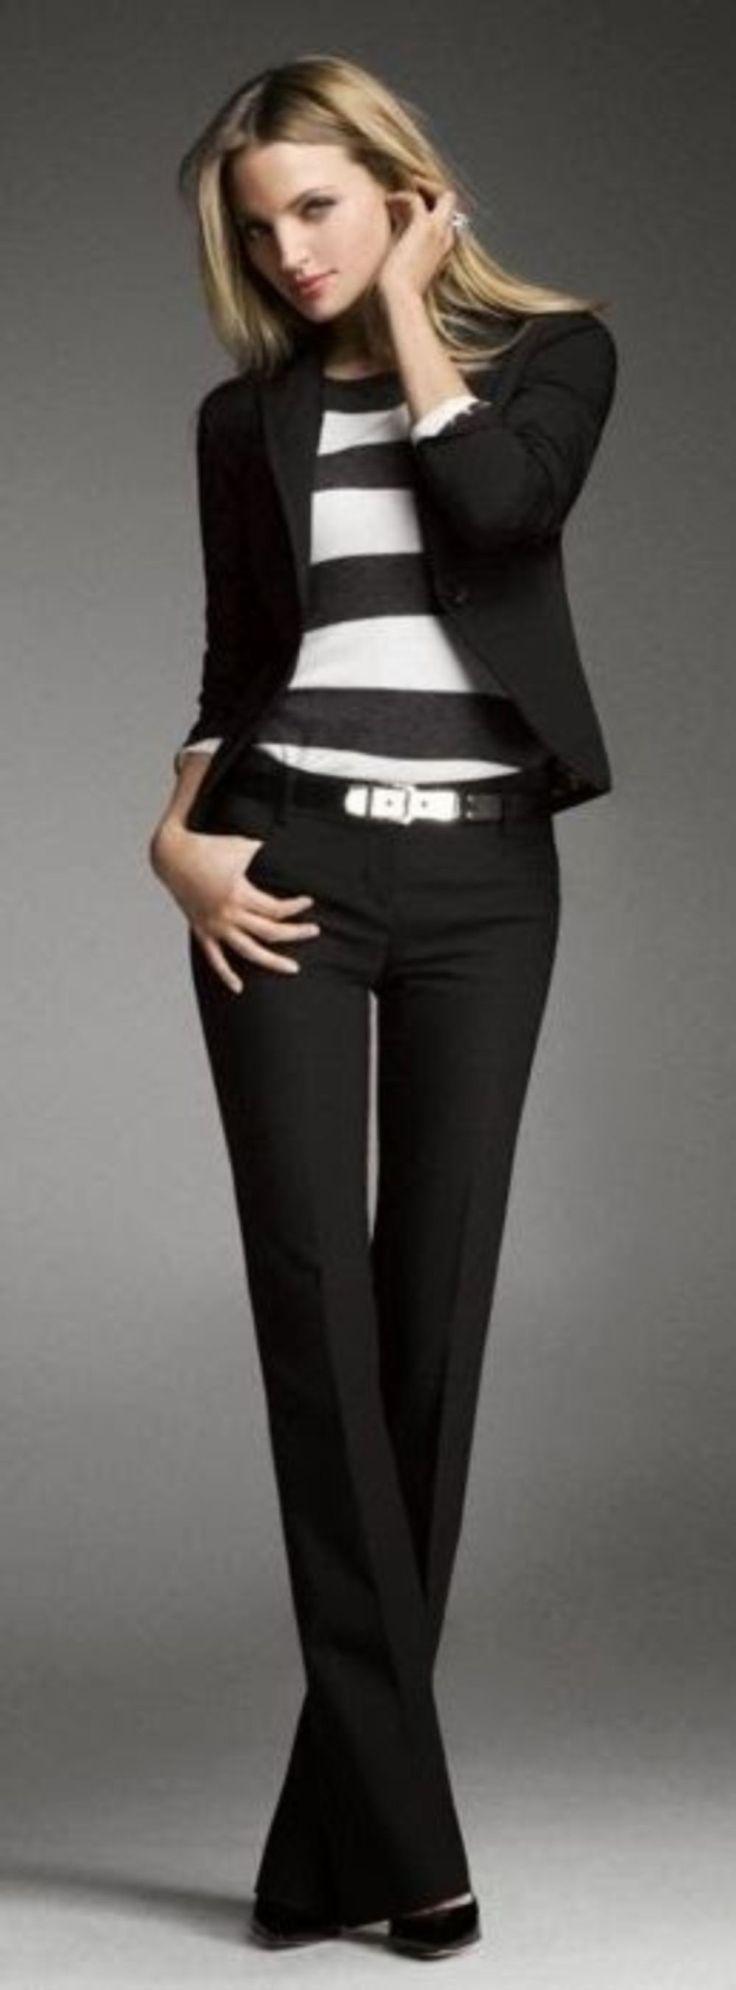 Best 25+ Women's interview outfits ideas on Pinterest ...